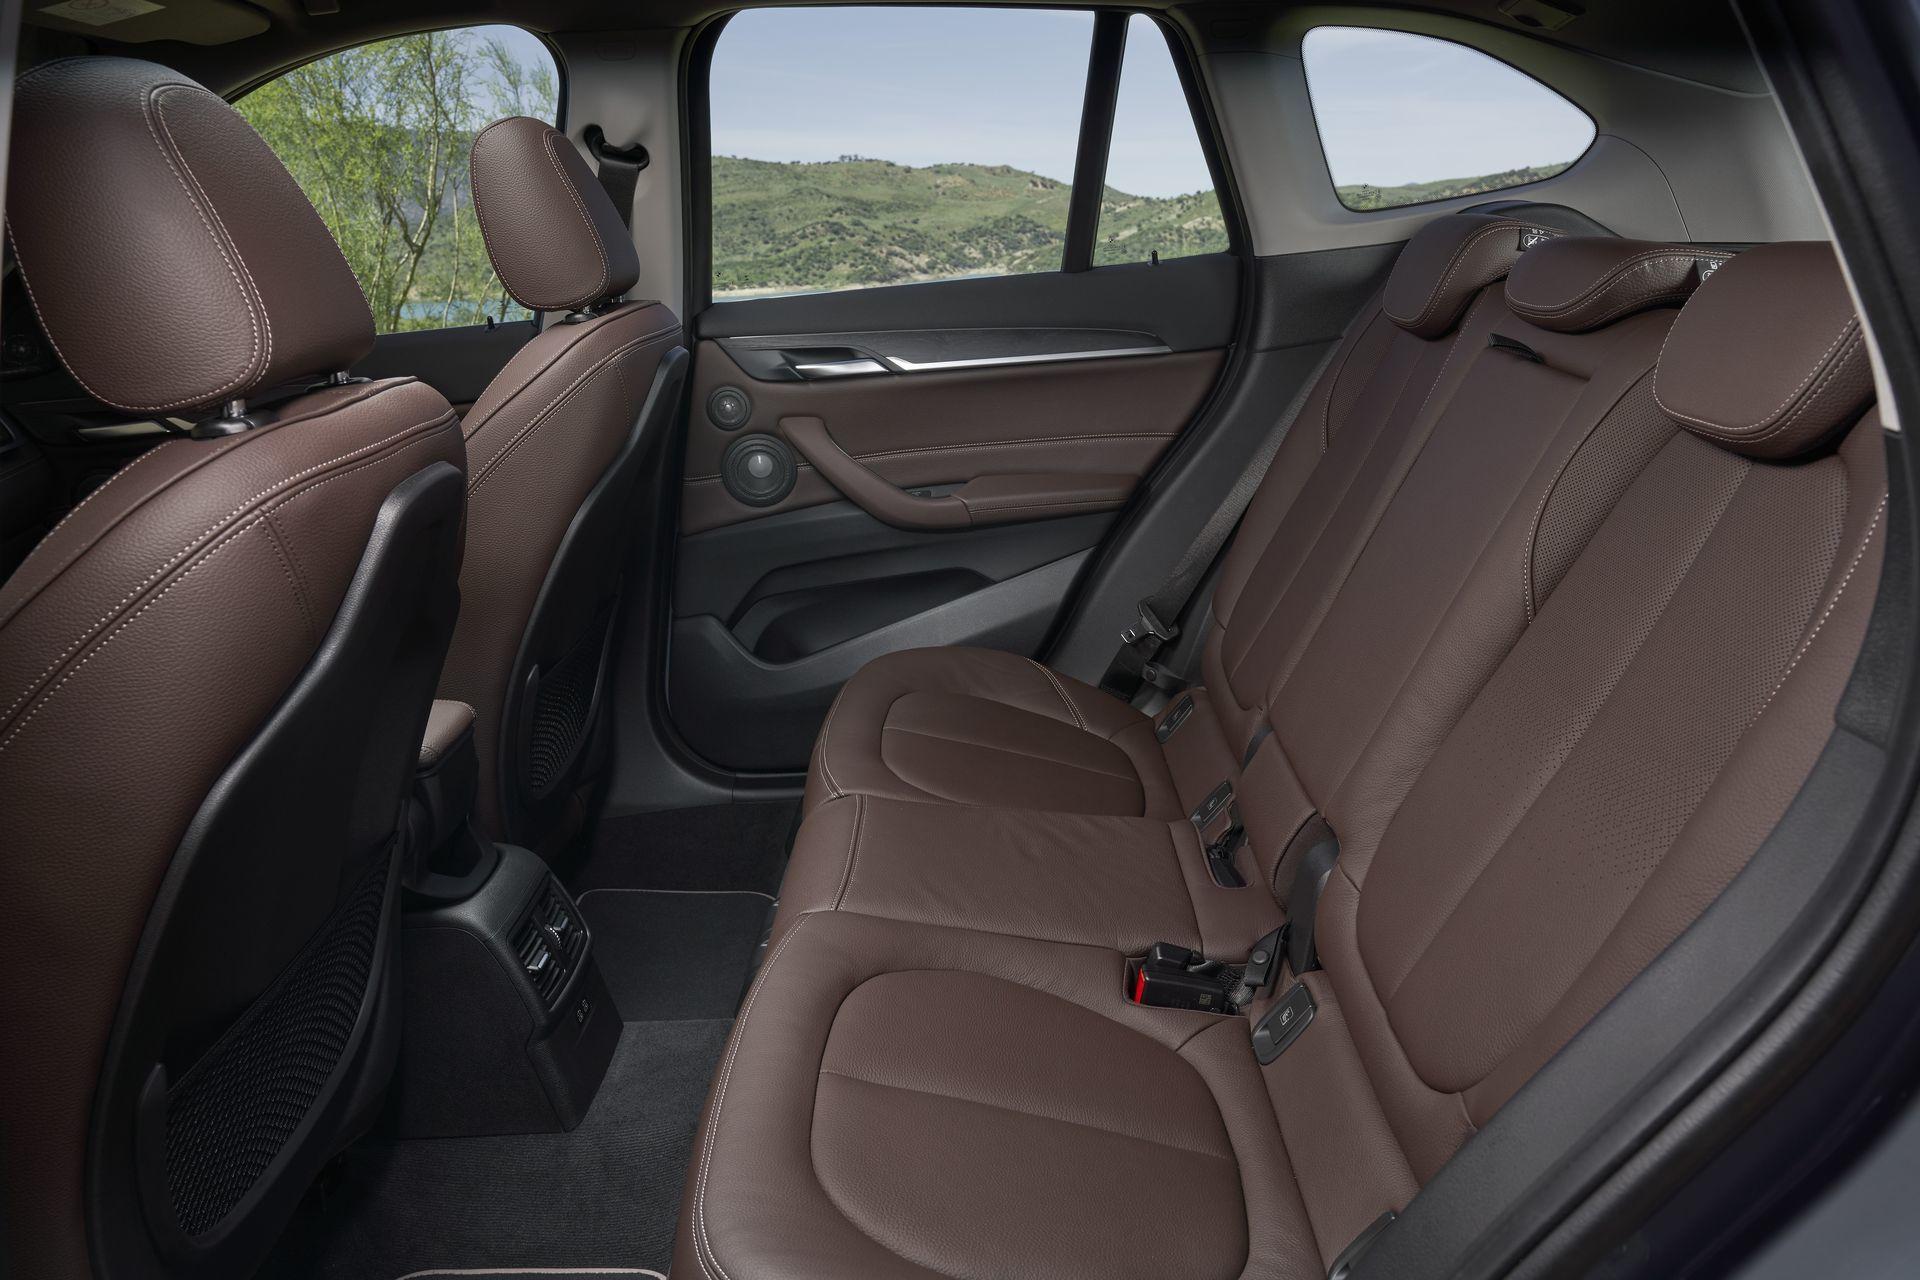 Bmw X1 2019 4 Interior